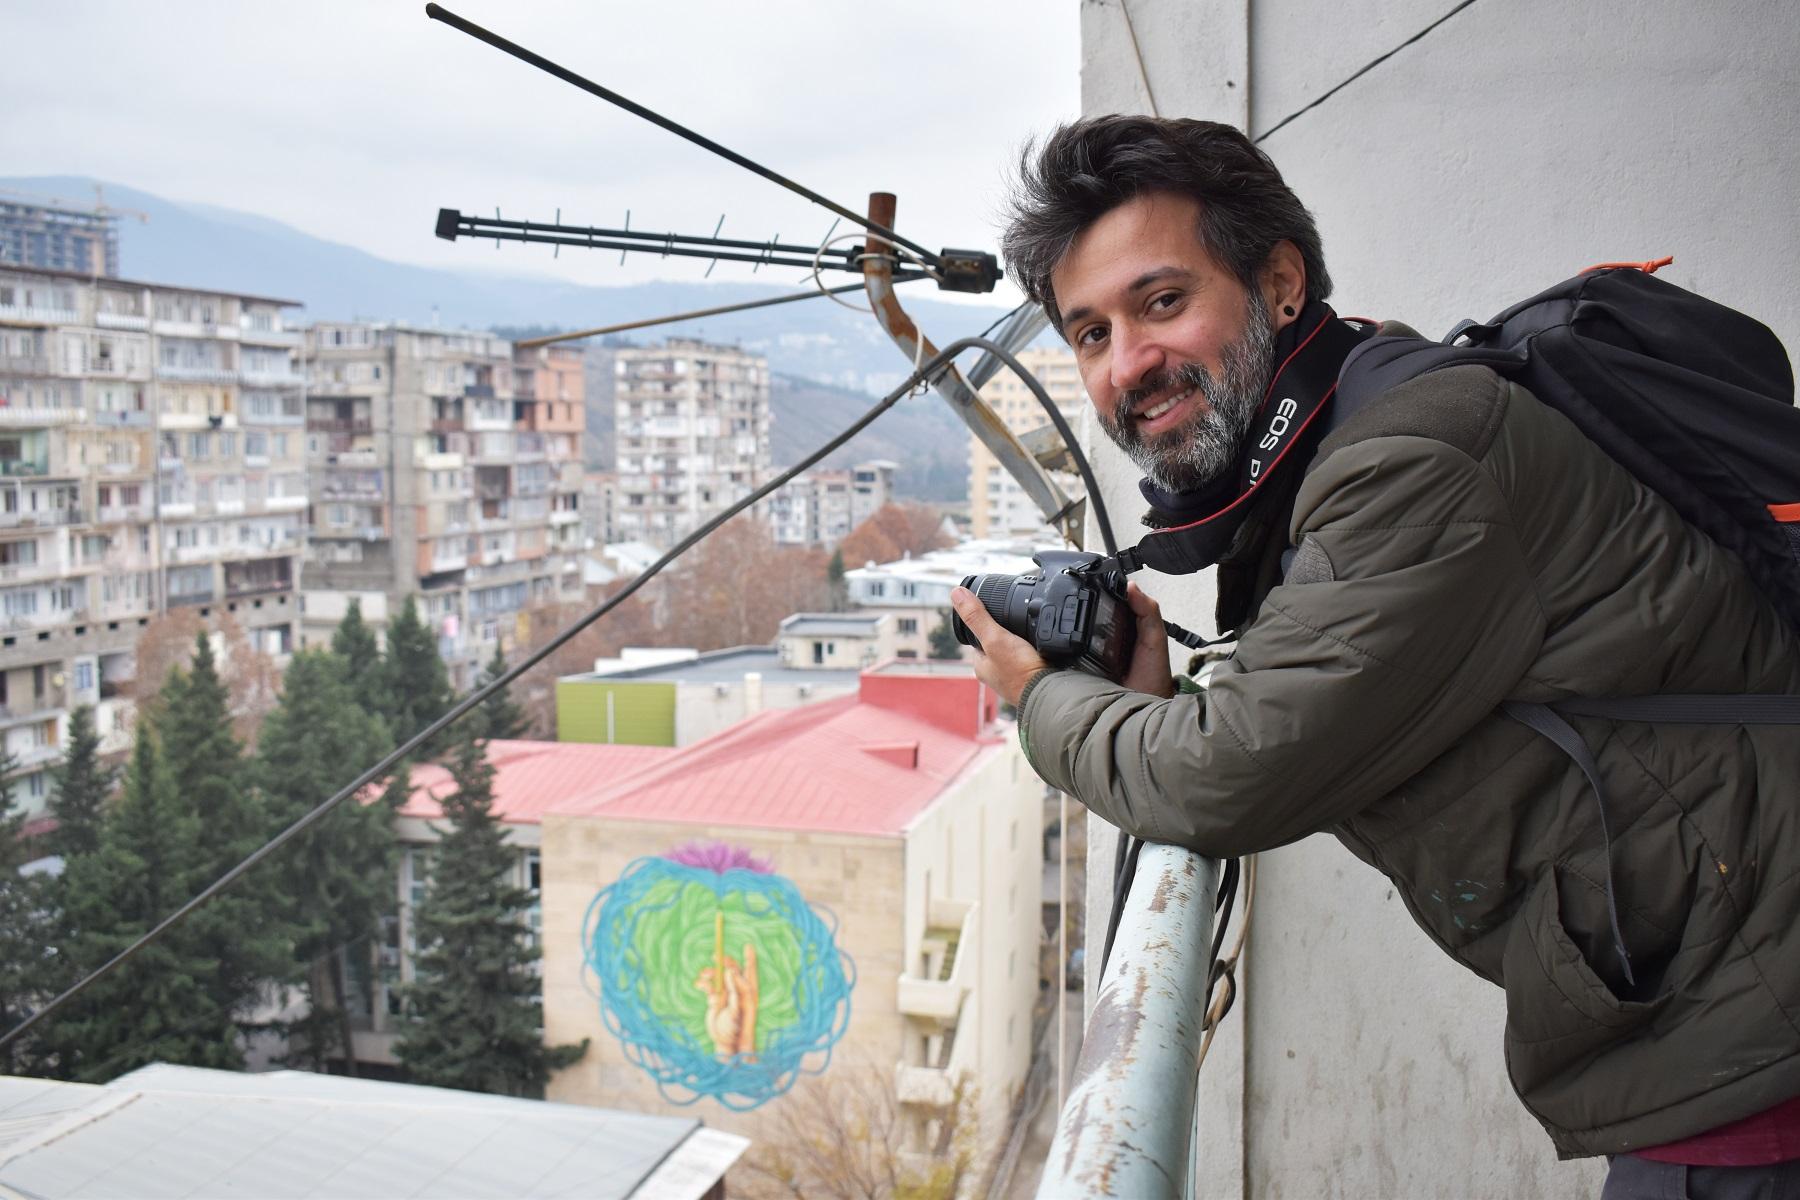 5 #art featured, арт, Бразилия, германия, граффити, Грузия, Дино Бенто, искусство, Лапиз, мурал, Саша Корбан, стрит-арт, тбилиси, украина